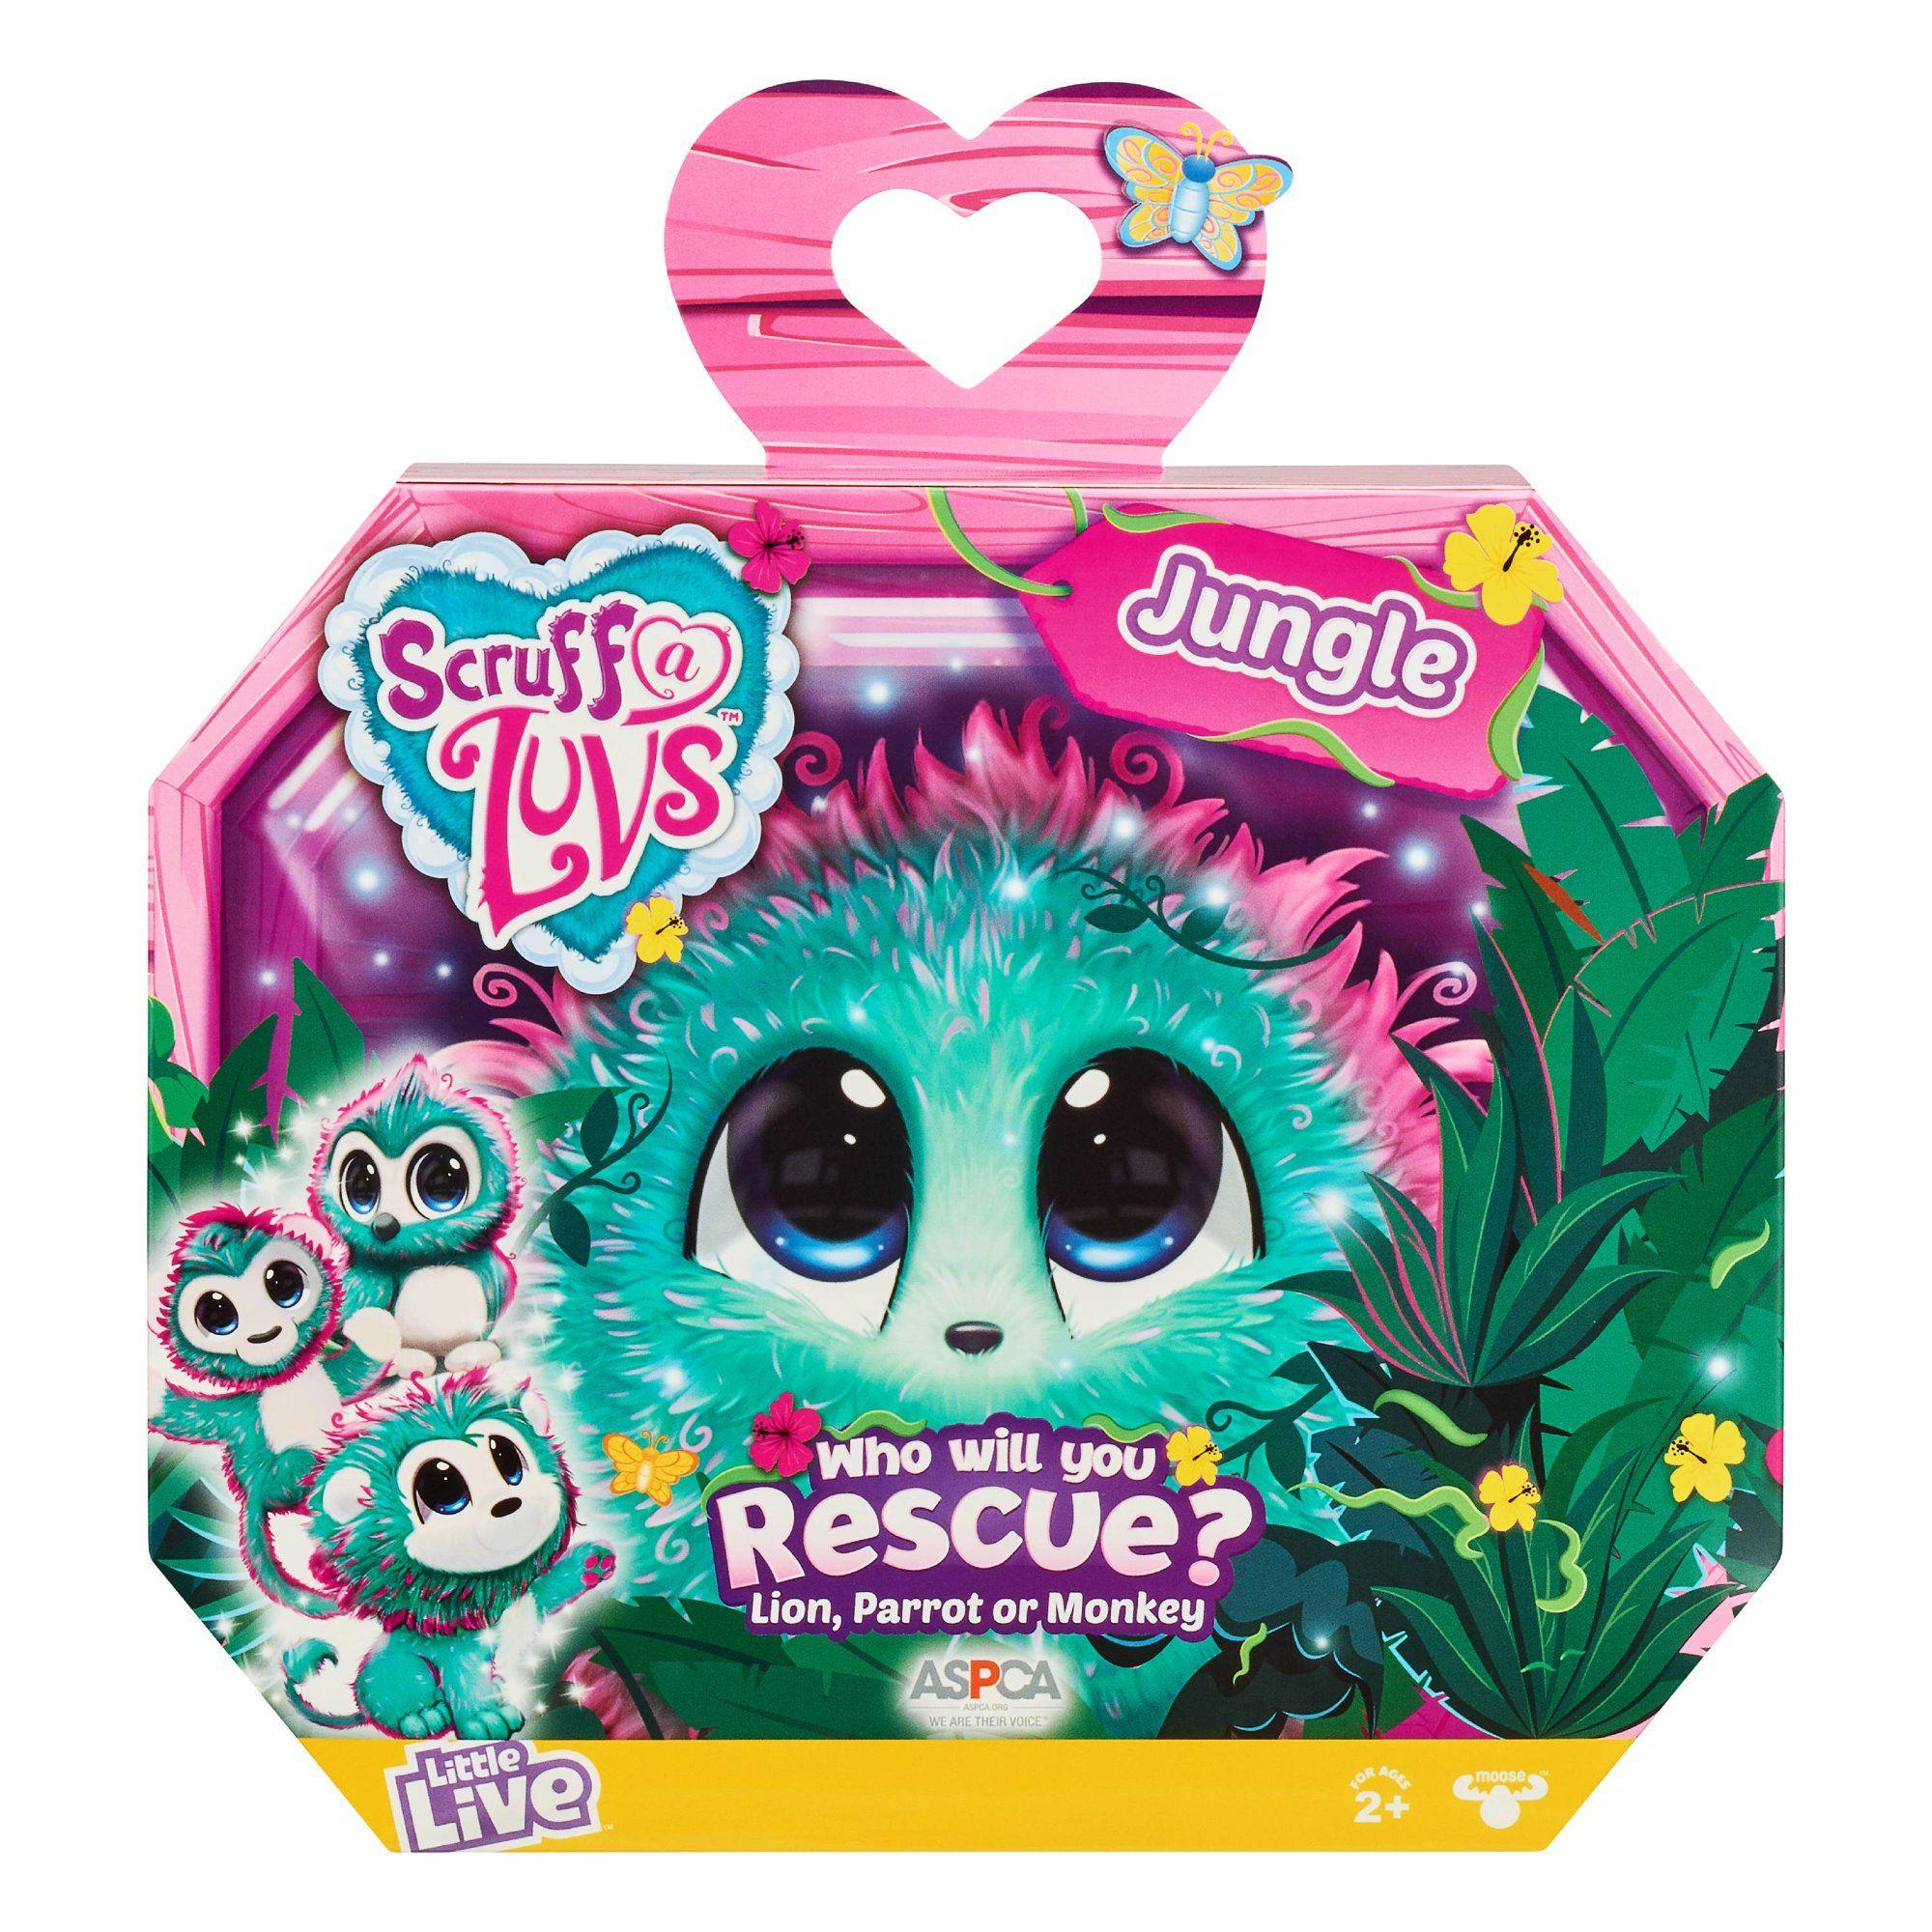 Little Live Pets Scruff A Luvs Jungle Plush Mystery Rescue Pet Walmart Com In 2020 Little Live Pets Animal Rescue Luvs